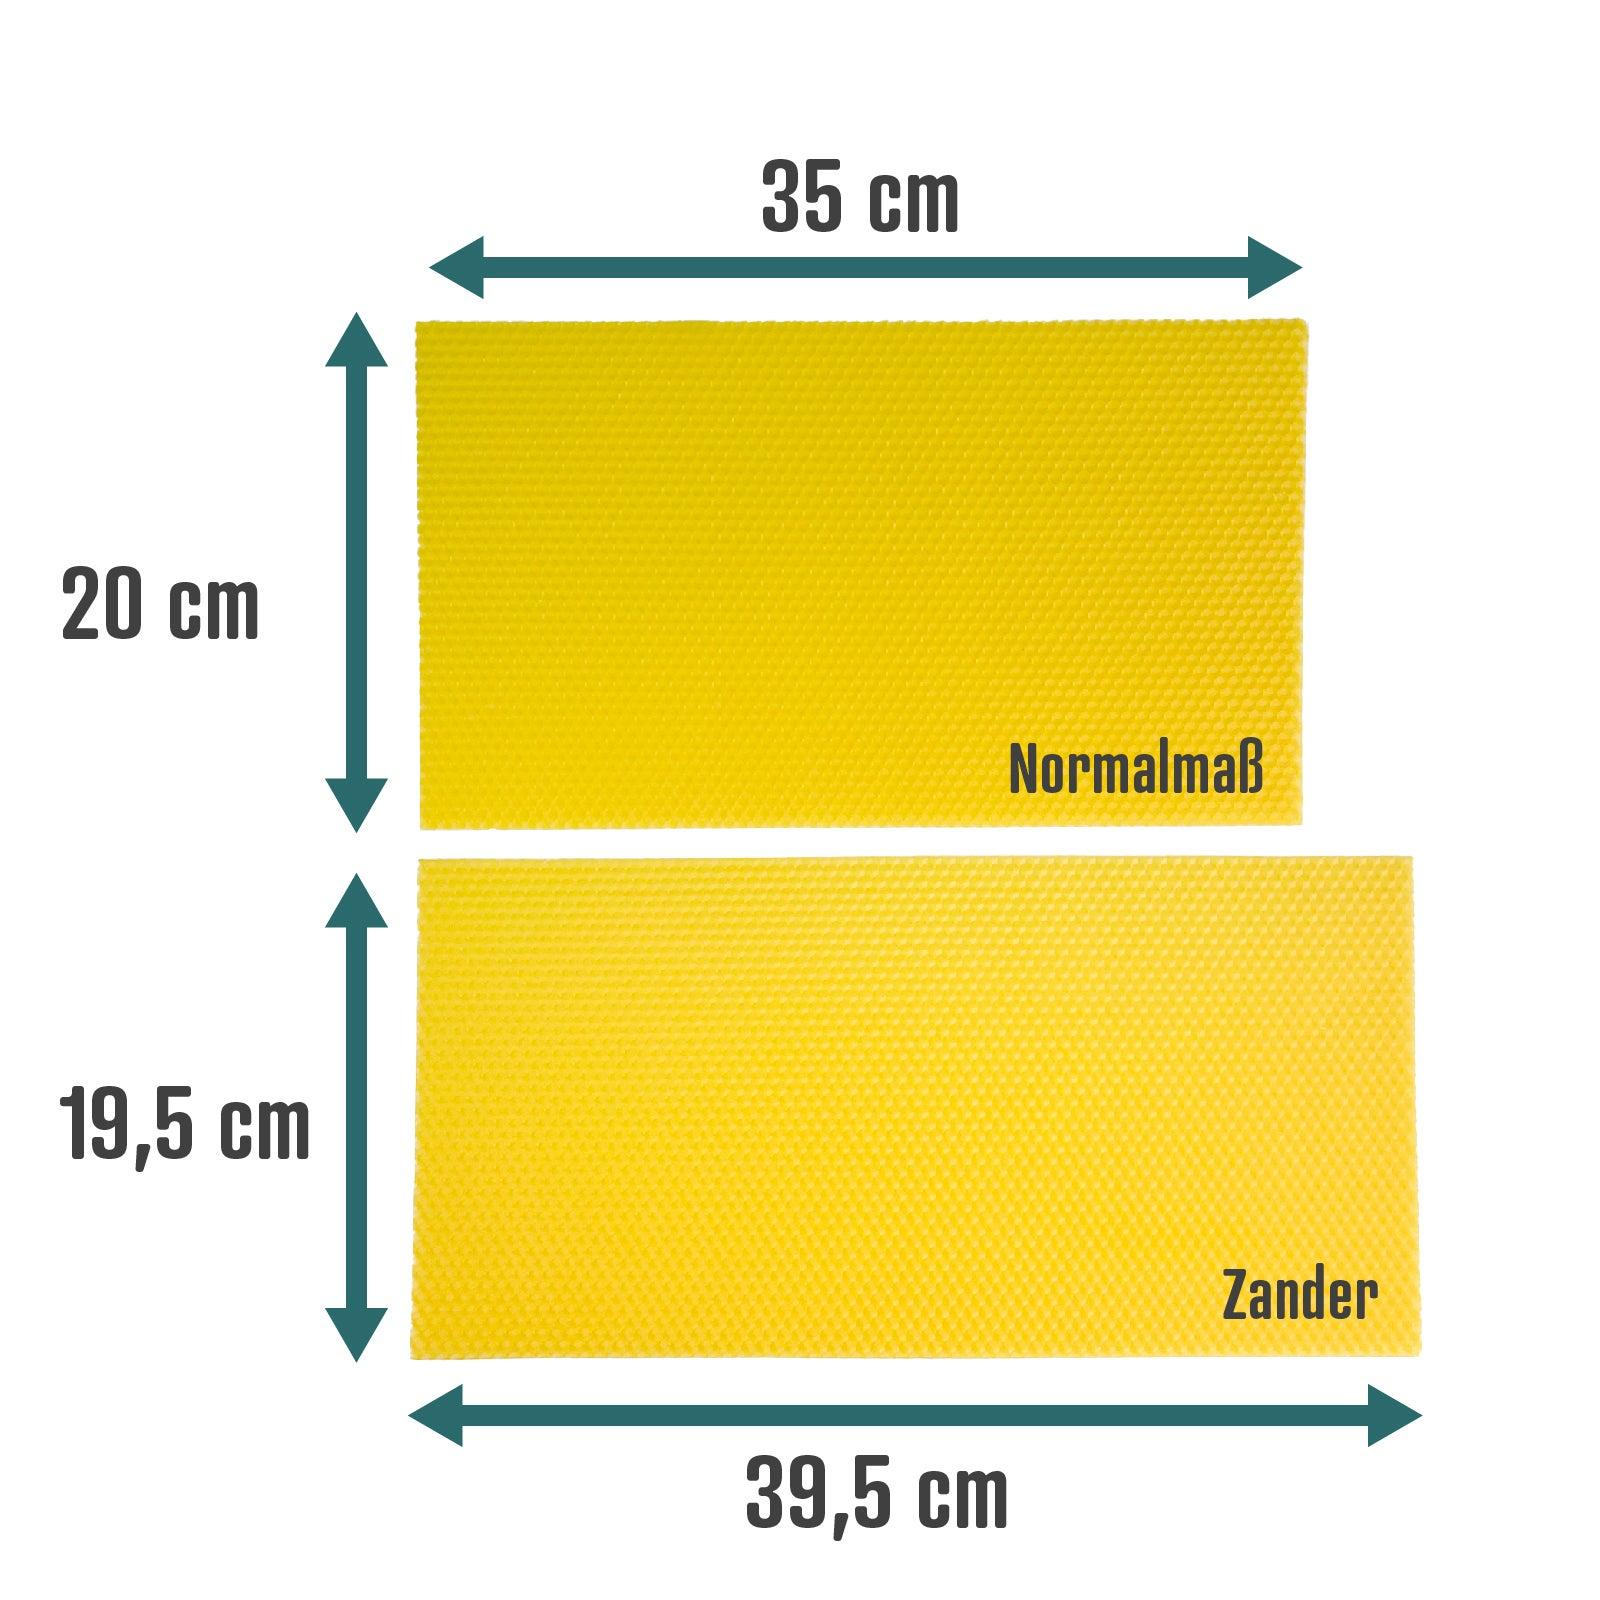 Mittelwände - Normalmaß - 350 X 200 mm